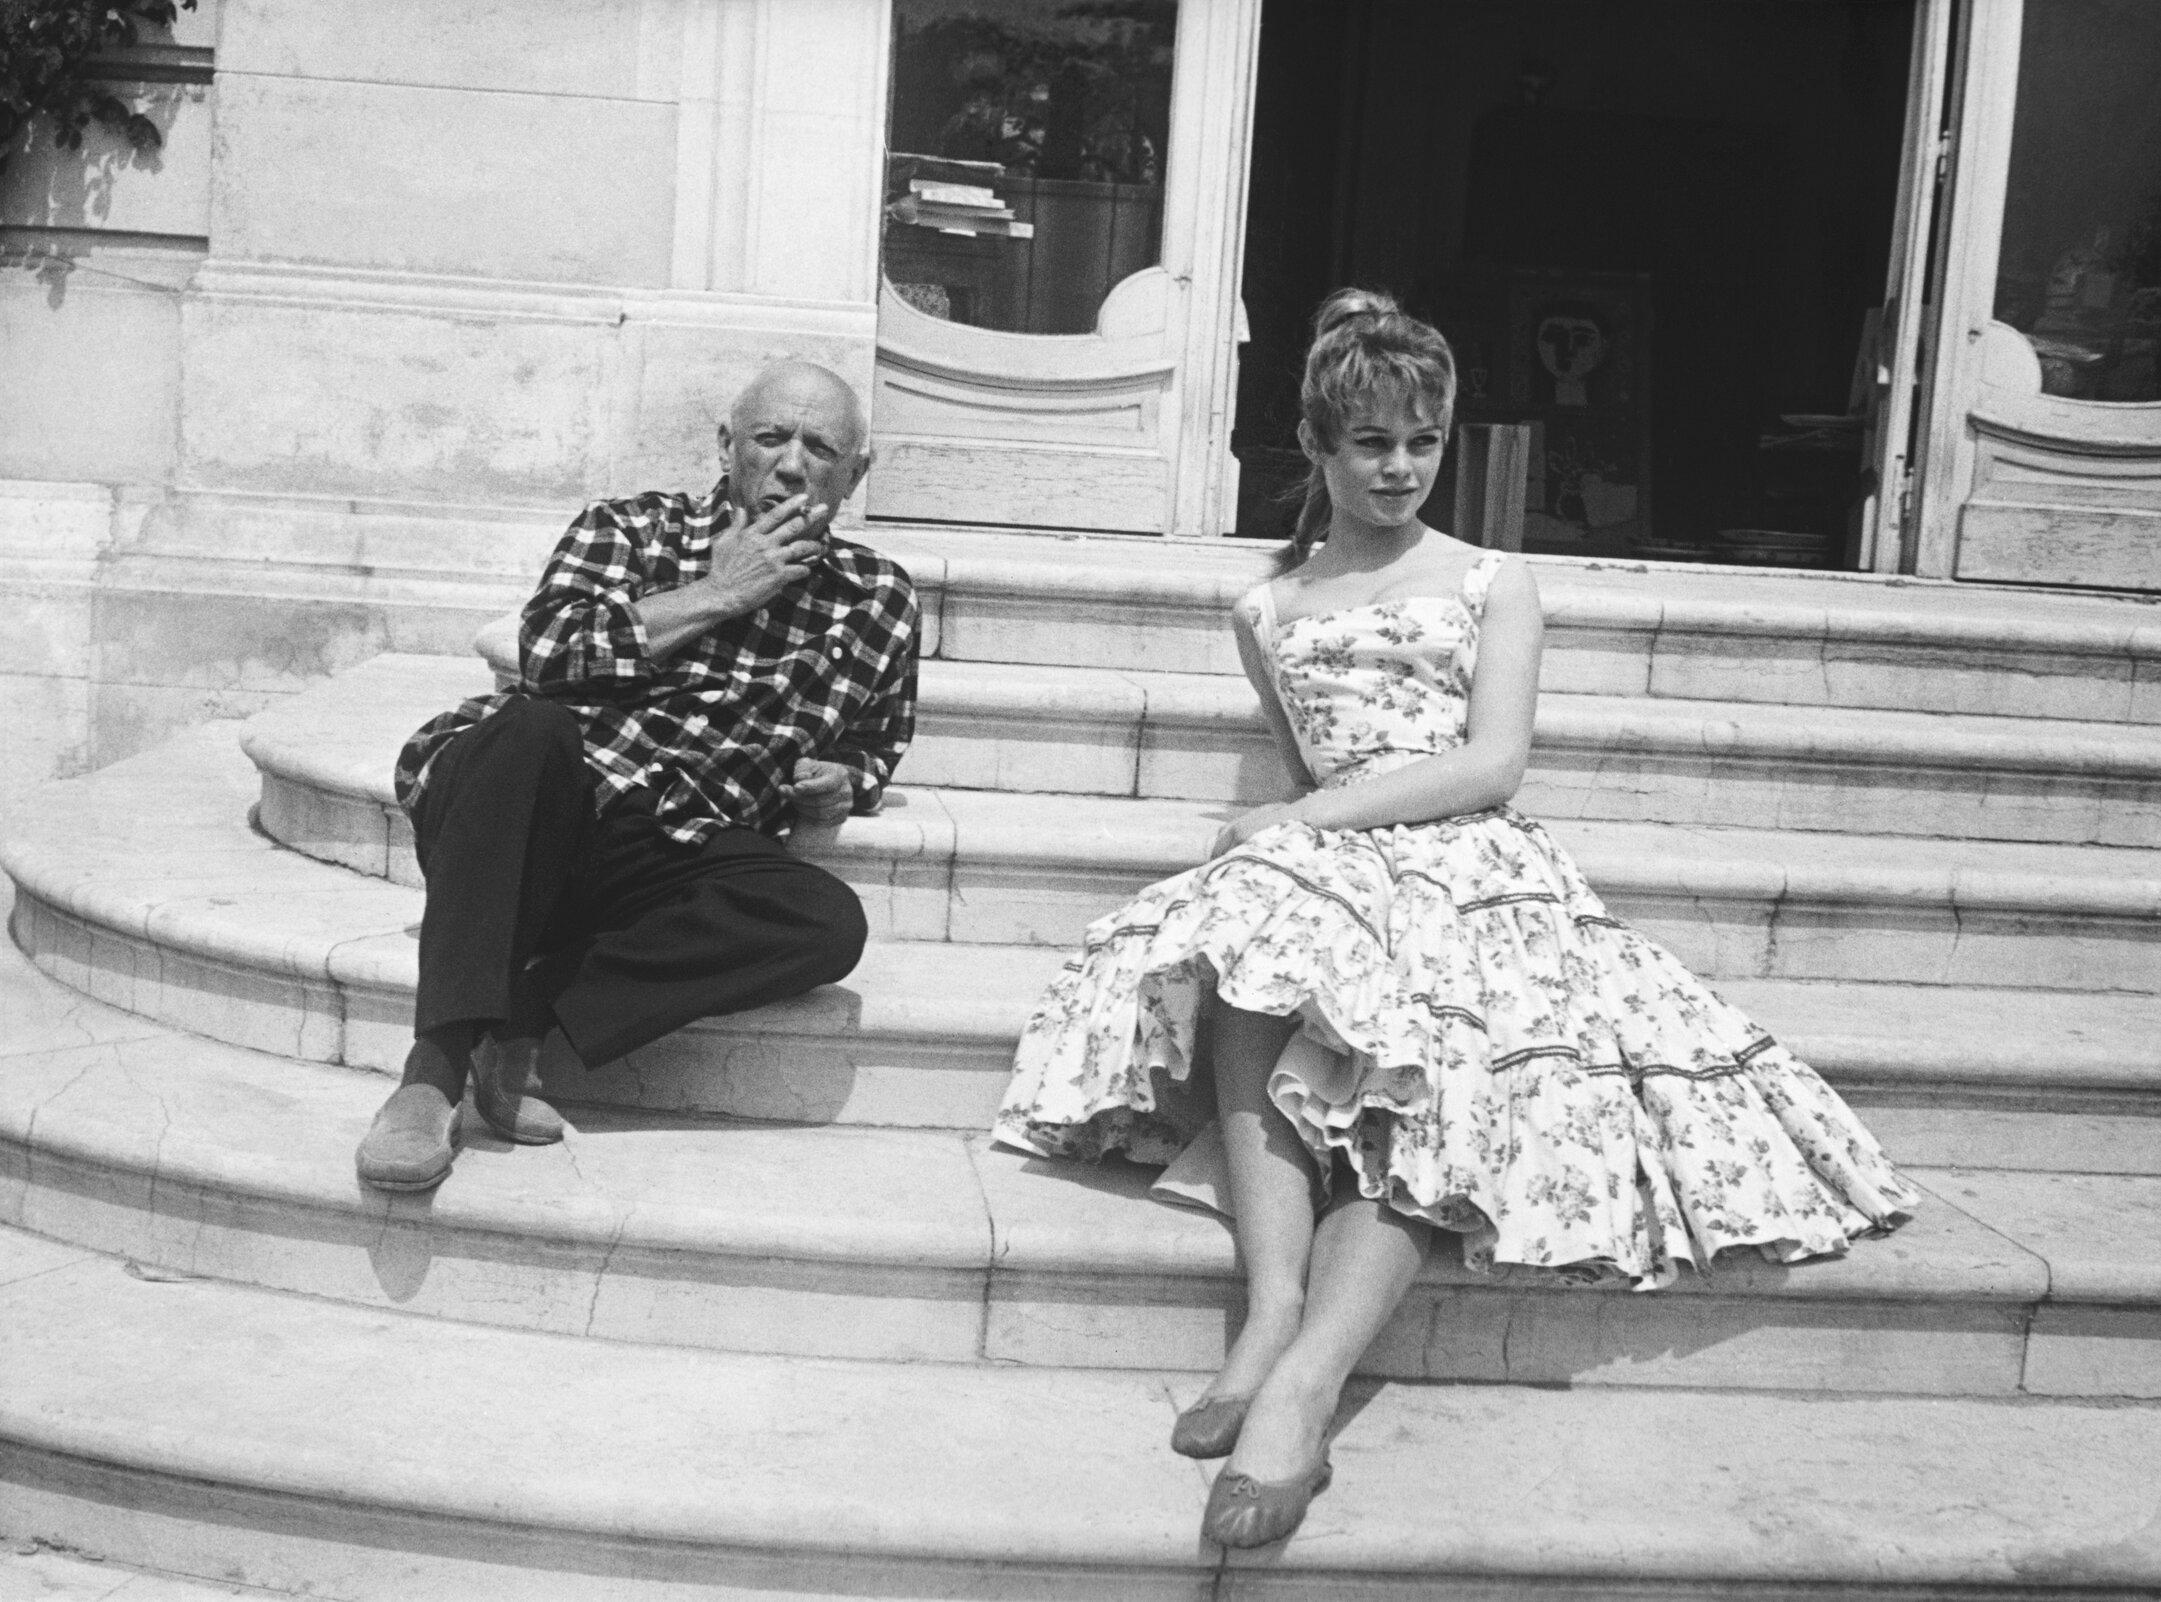 Брижит Бардо иПабло Пикассо, 1956